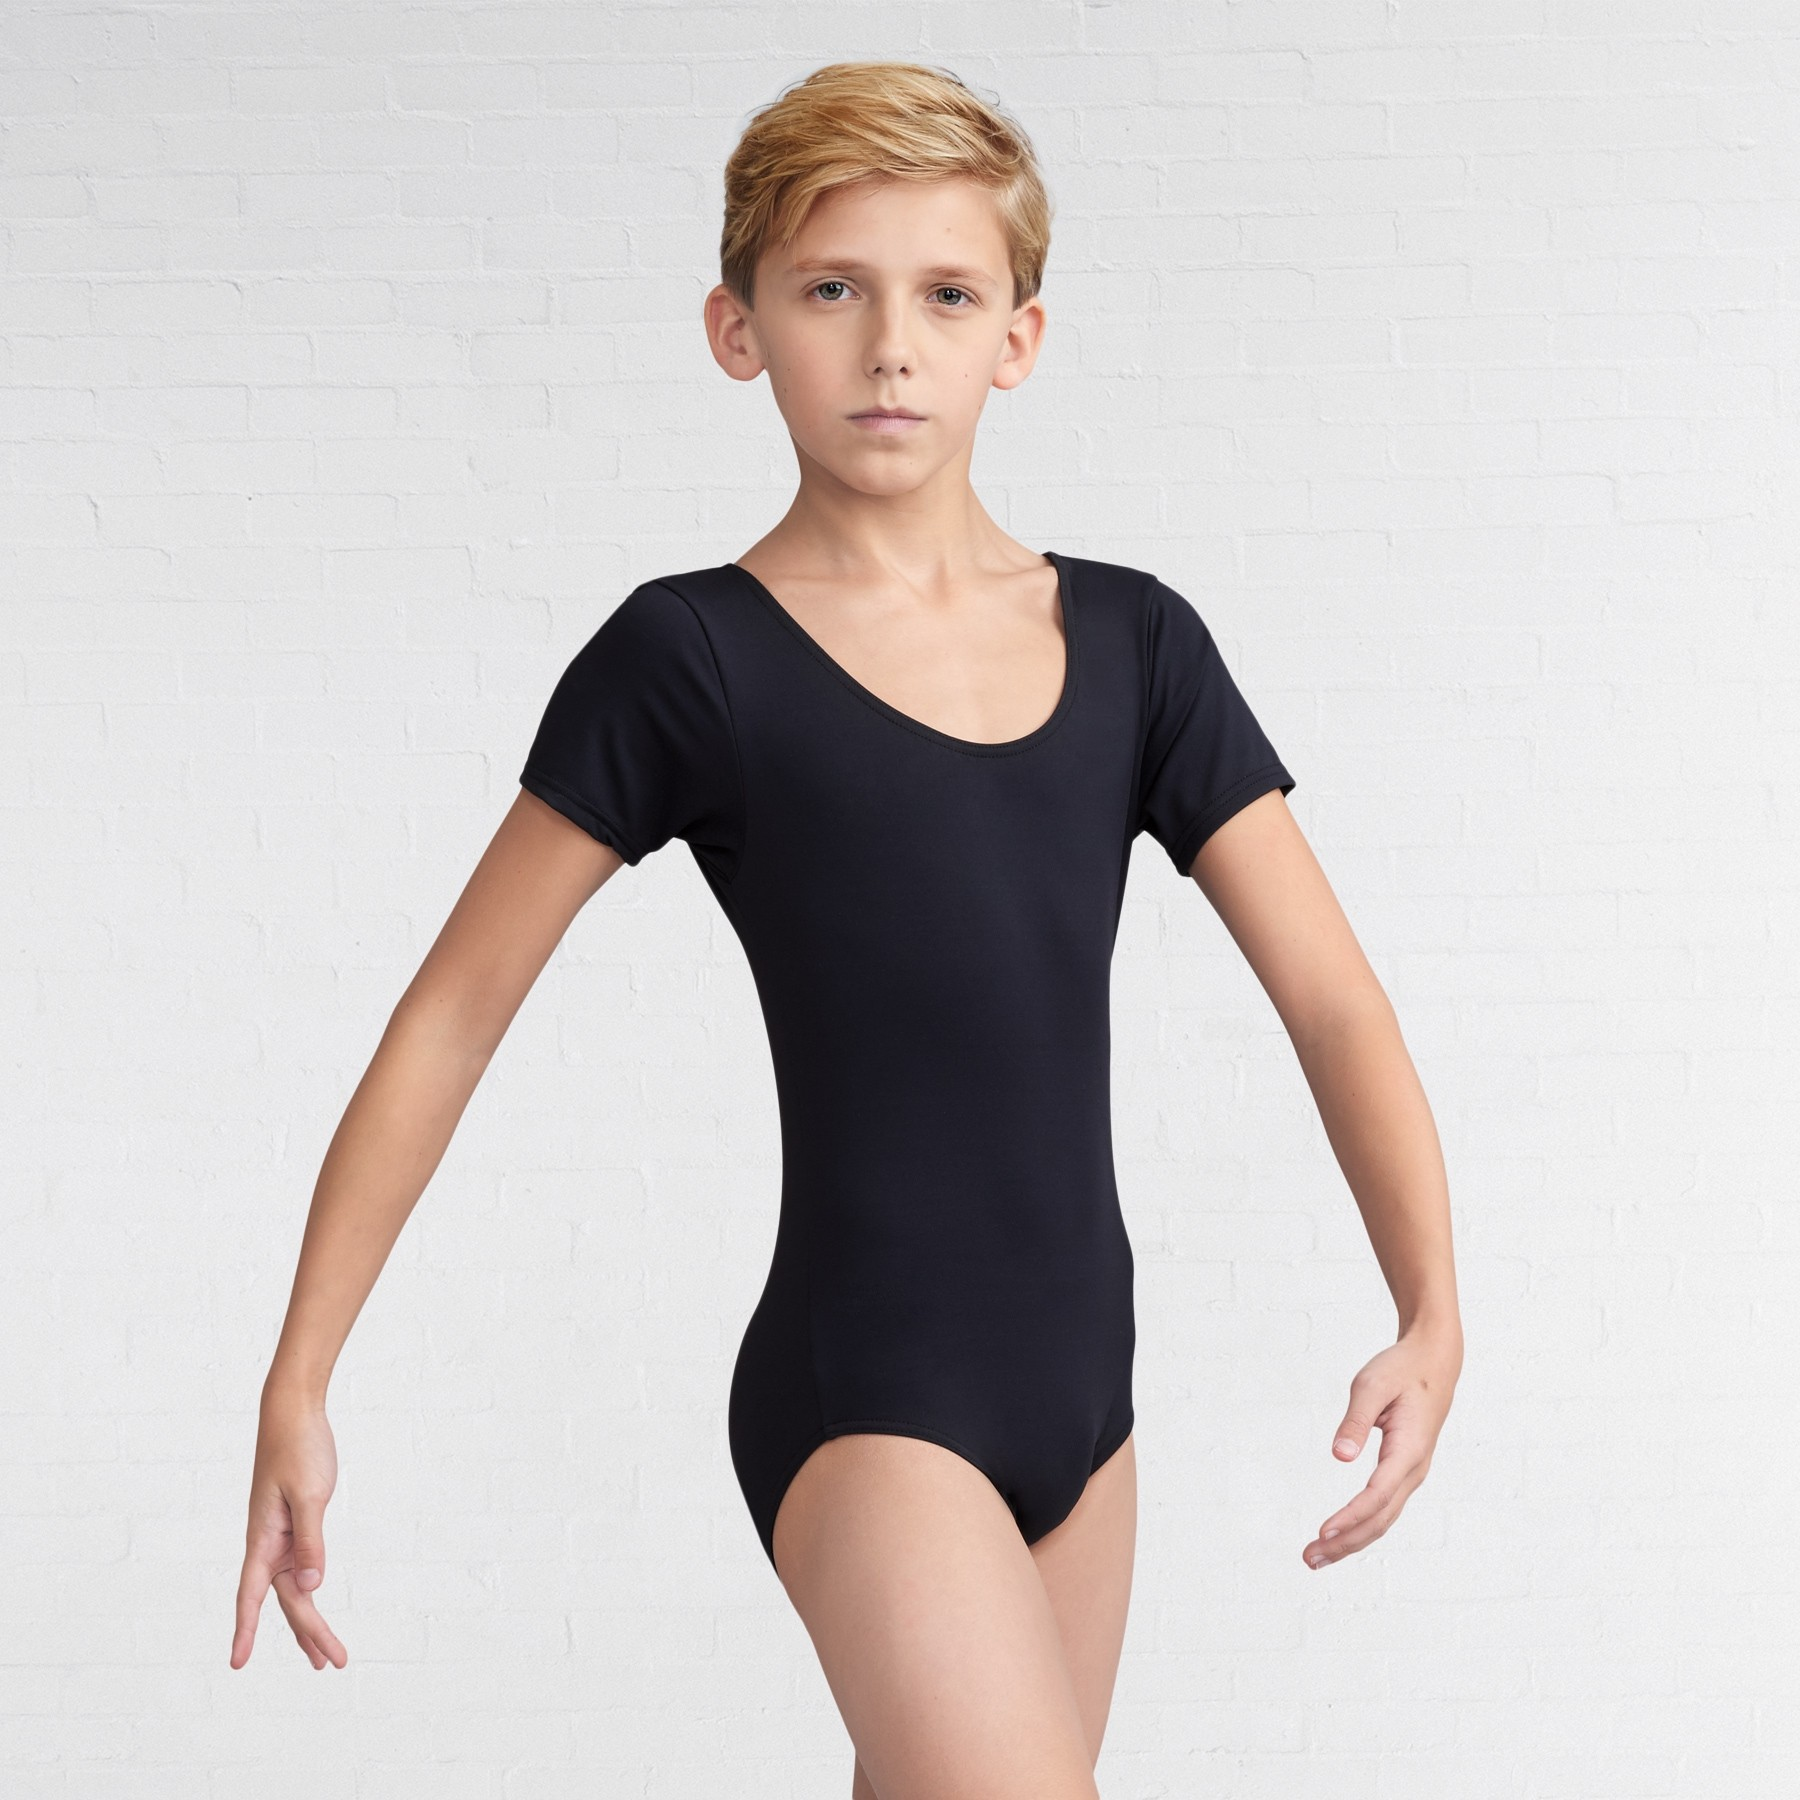 Capezio Tacctel® Short Sleeve Leotard - Boys